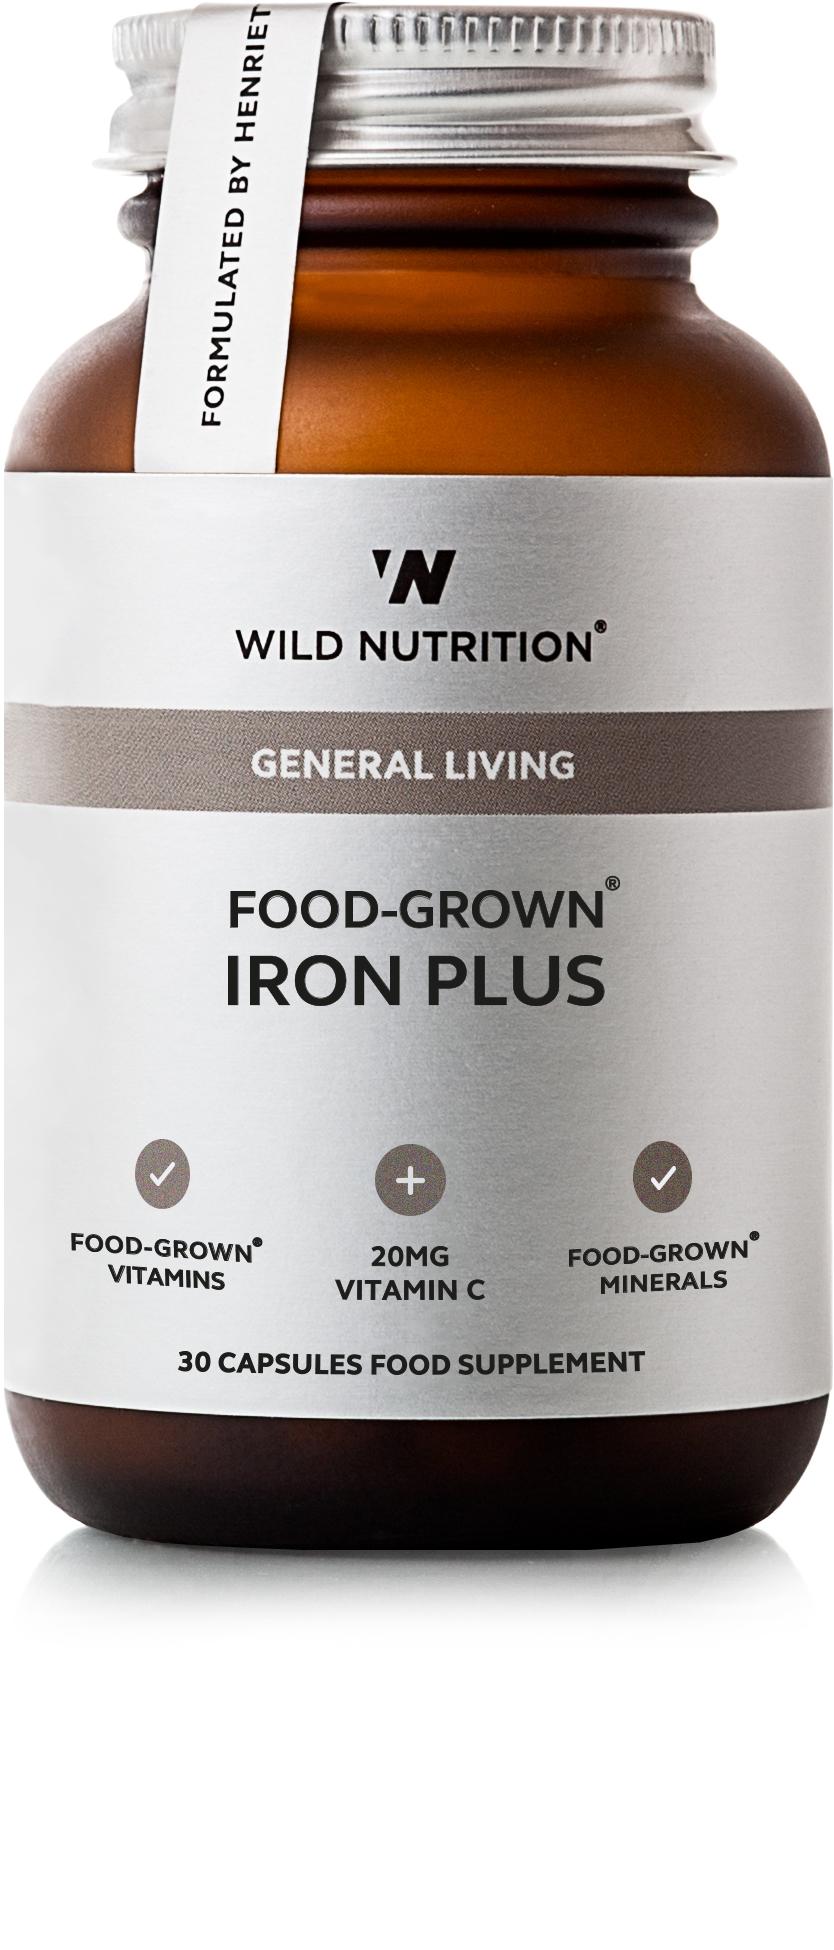 General Living Food-Grown Iron Plus 30's